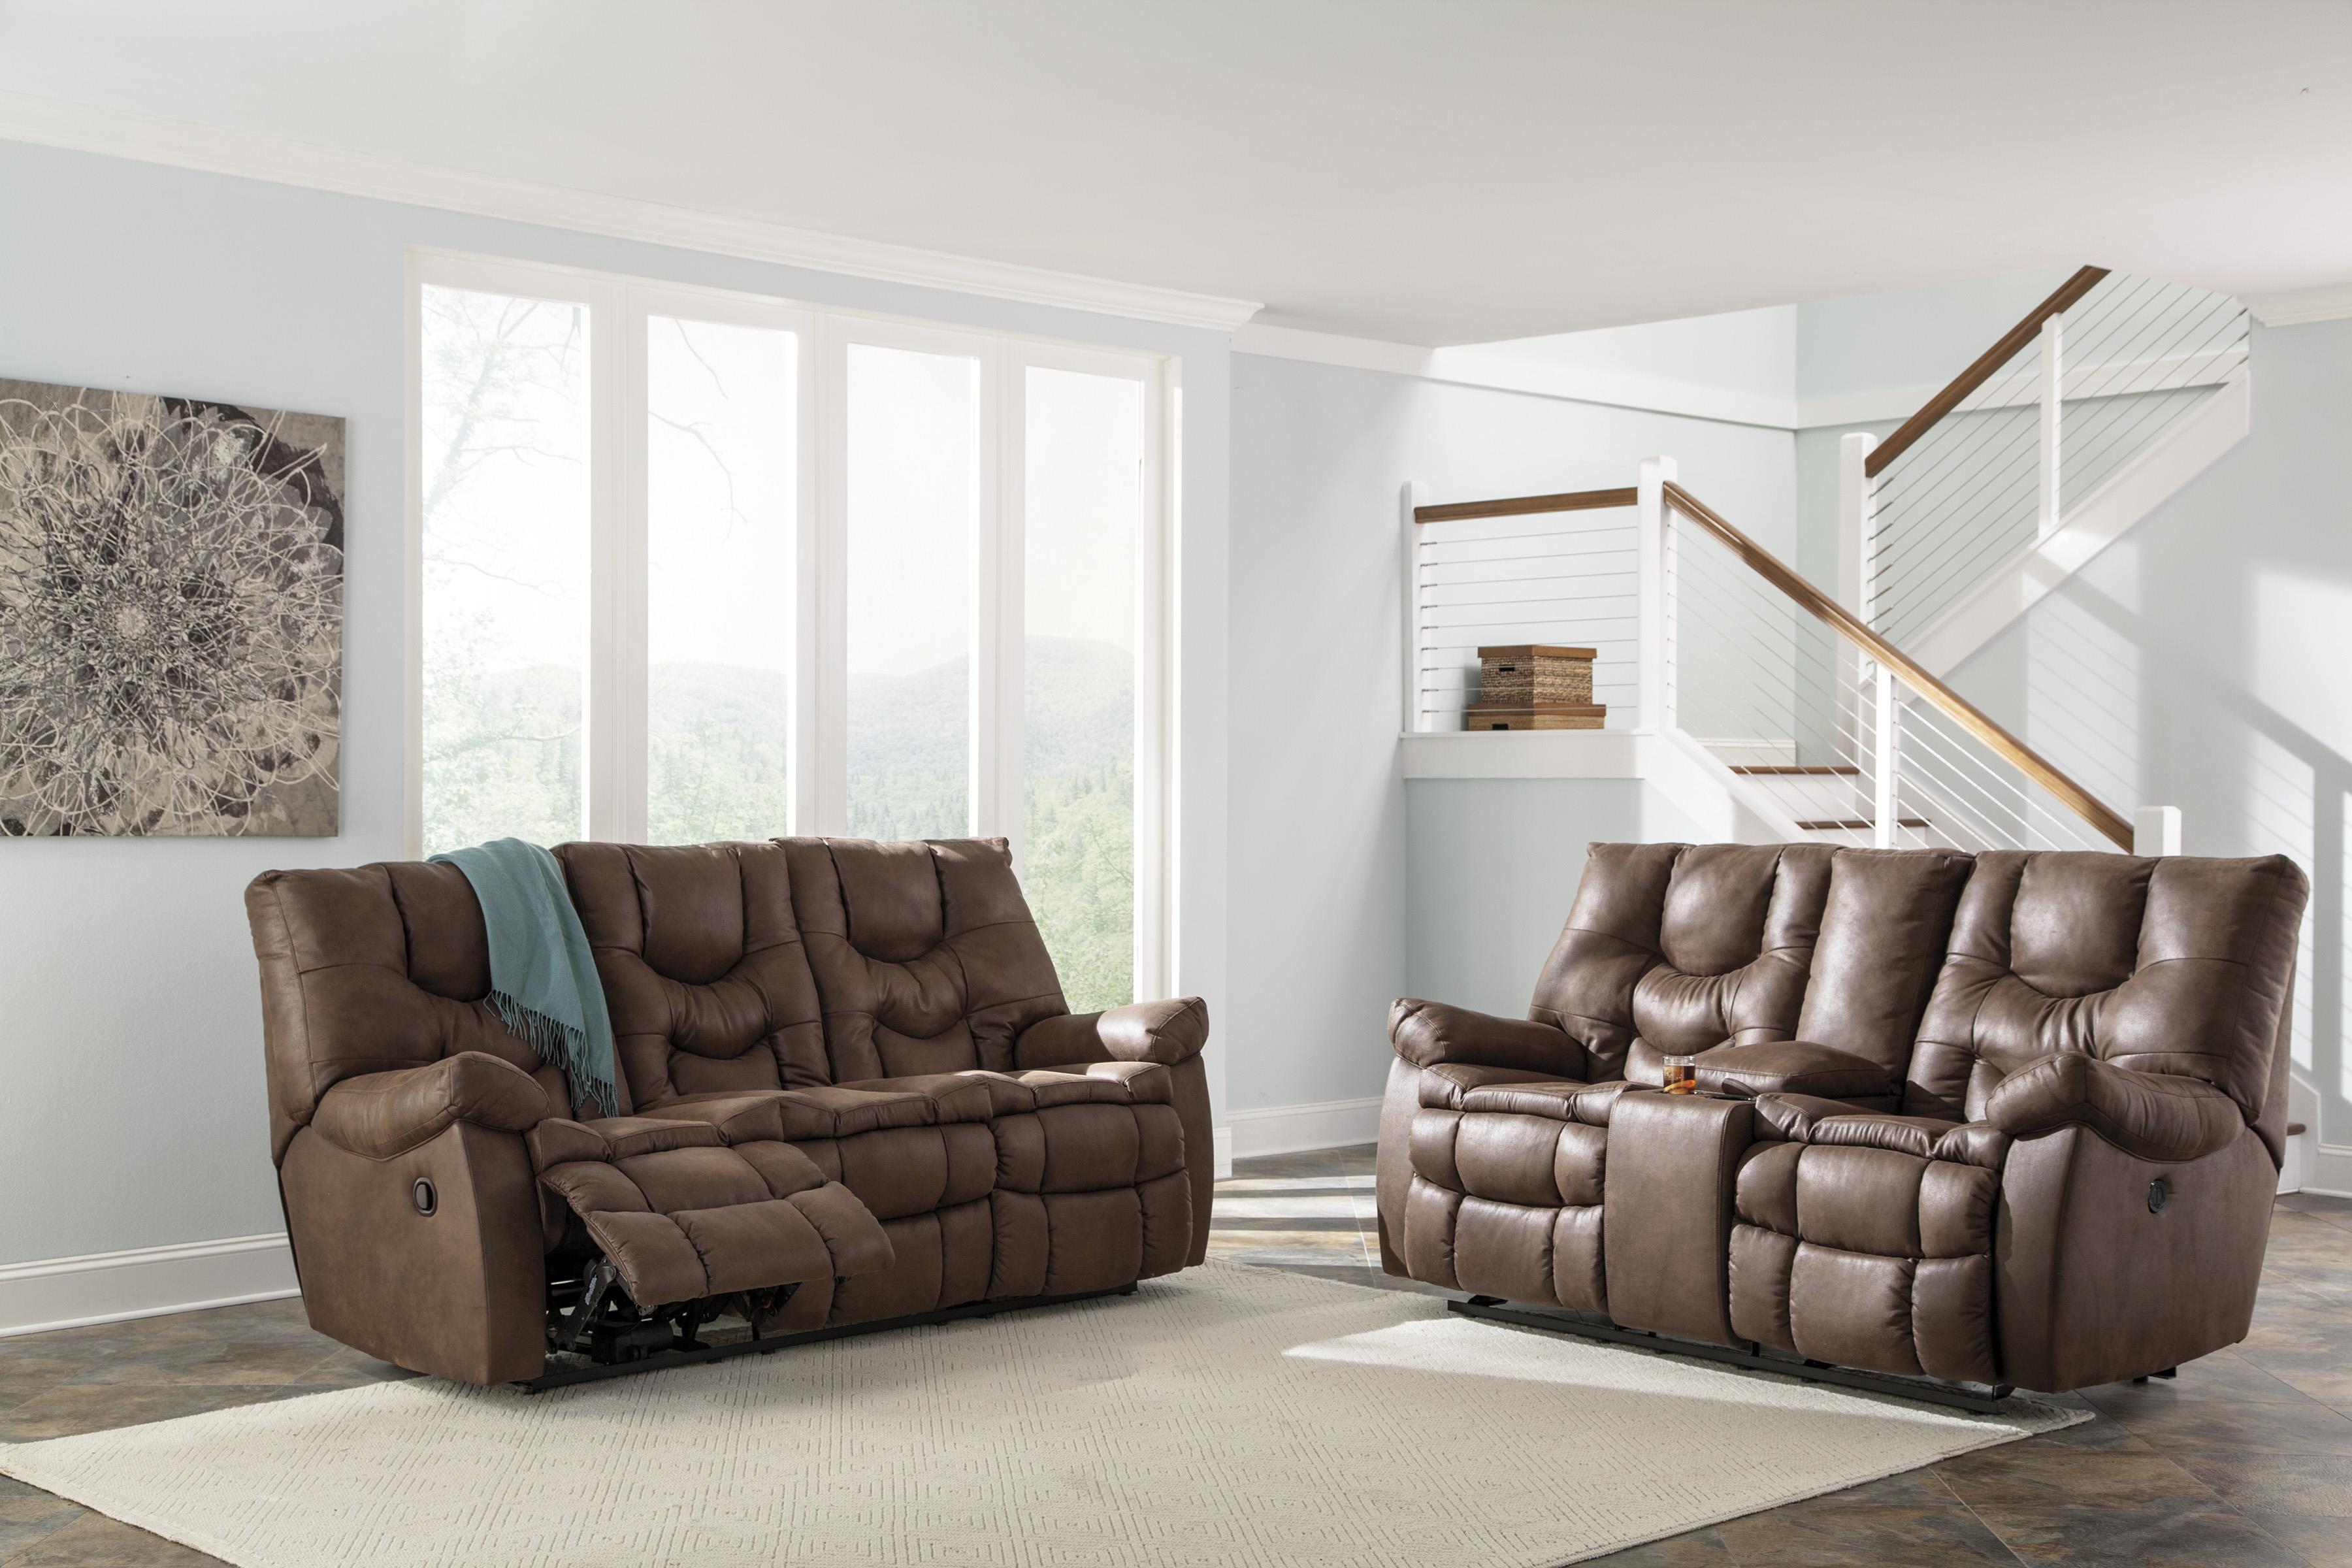 Ashley/Benchcraft Burgett Reclining Living Room Group - Item Number: 92201 Living Room Group 1